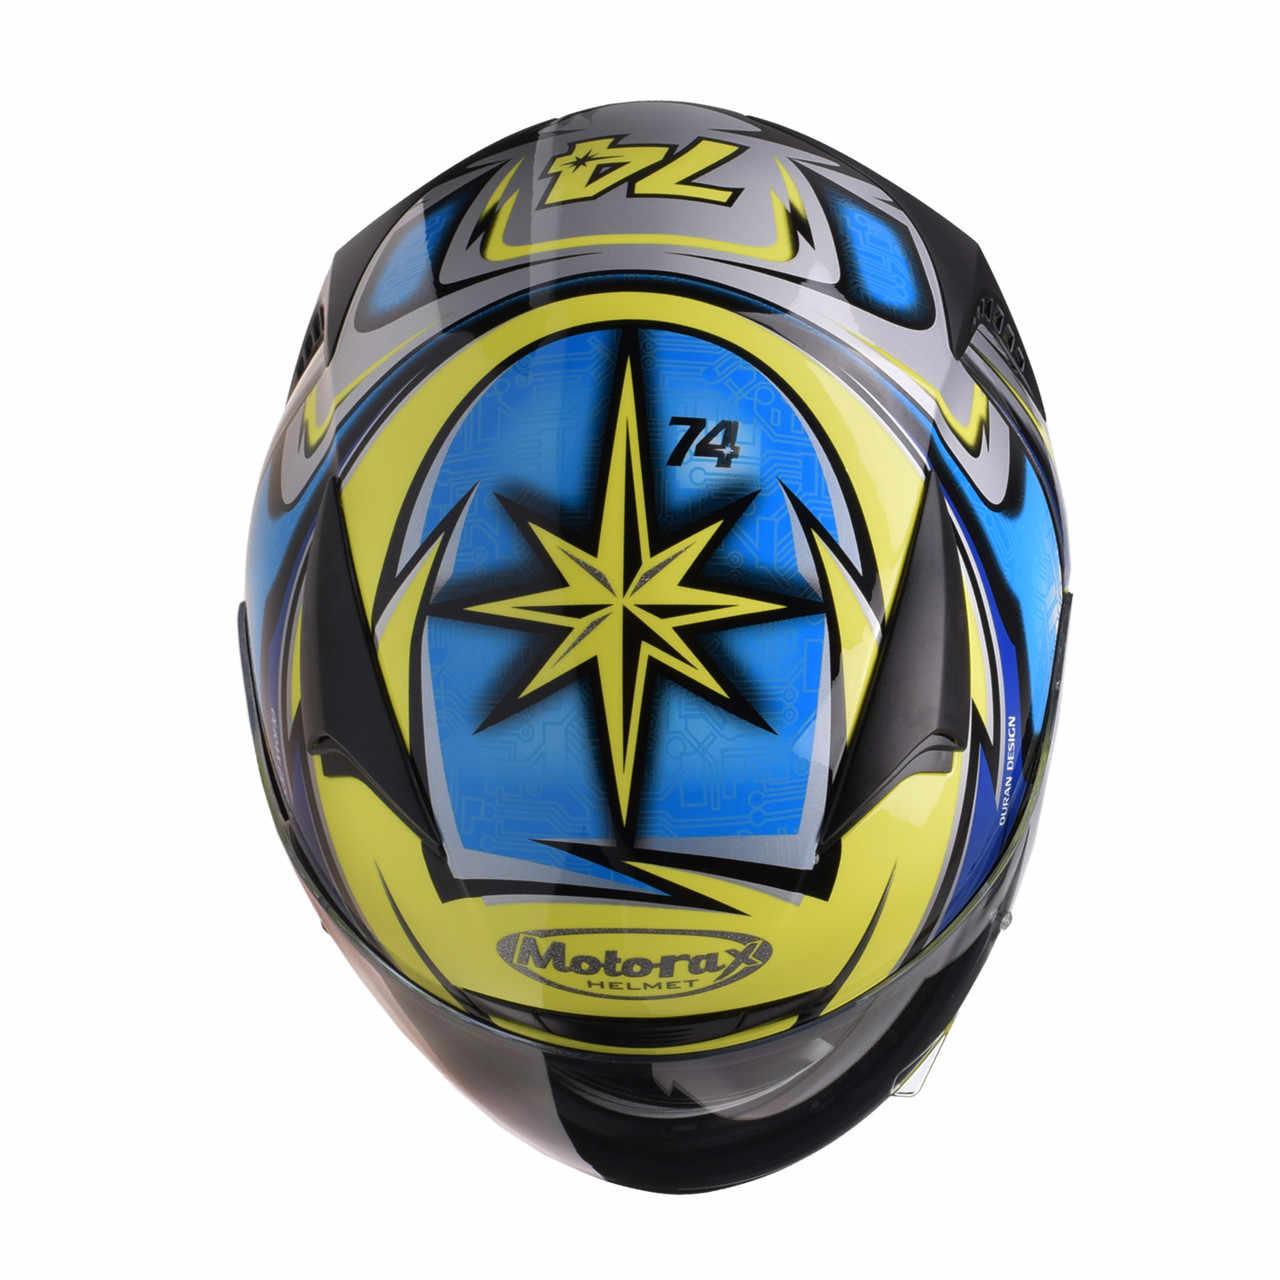 MOTORAX TR30 Corrida Casco do Capacete Da Motocicleta Rosto Cheio Capacetes Kask Casque Capacete Moto Leme Para Motociclista Moto